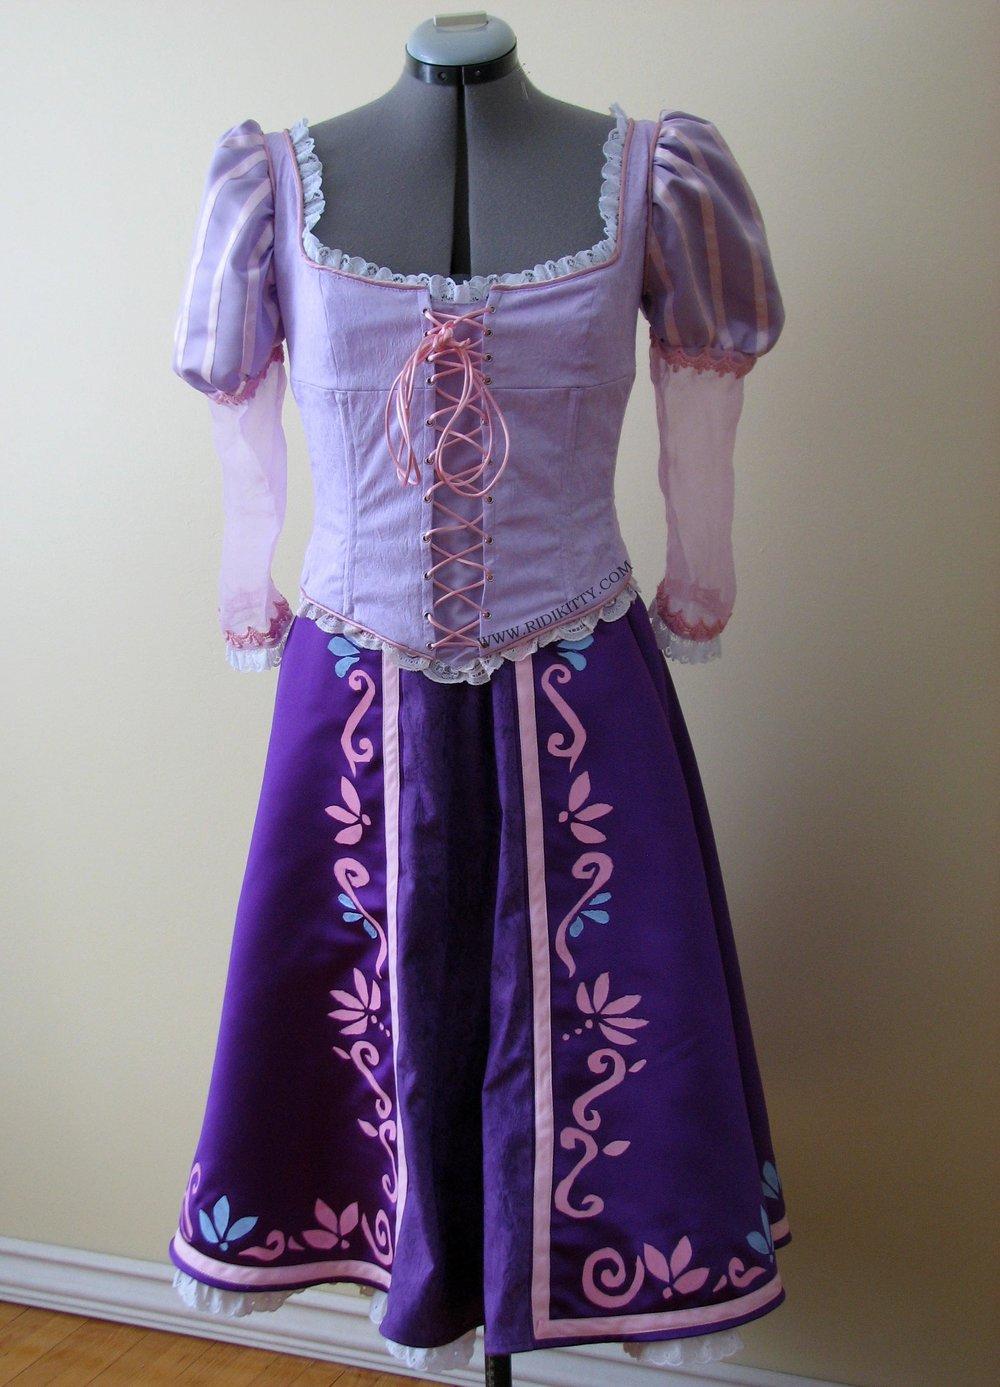 Rapunzel From Disney's Rapunzel